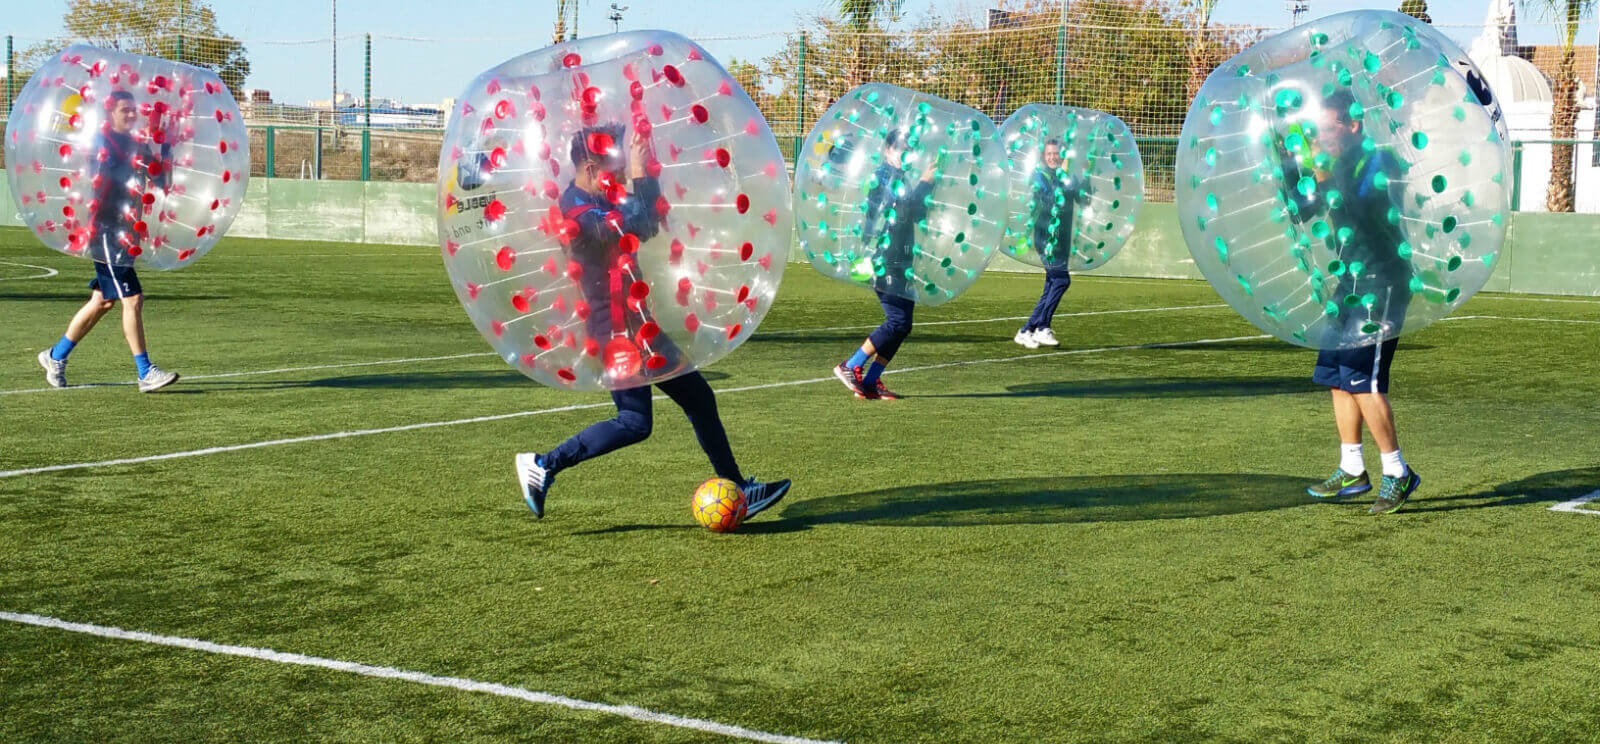 Zorb football